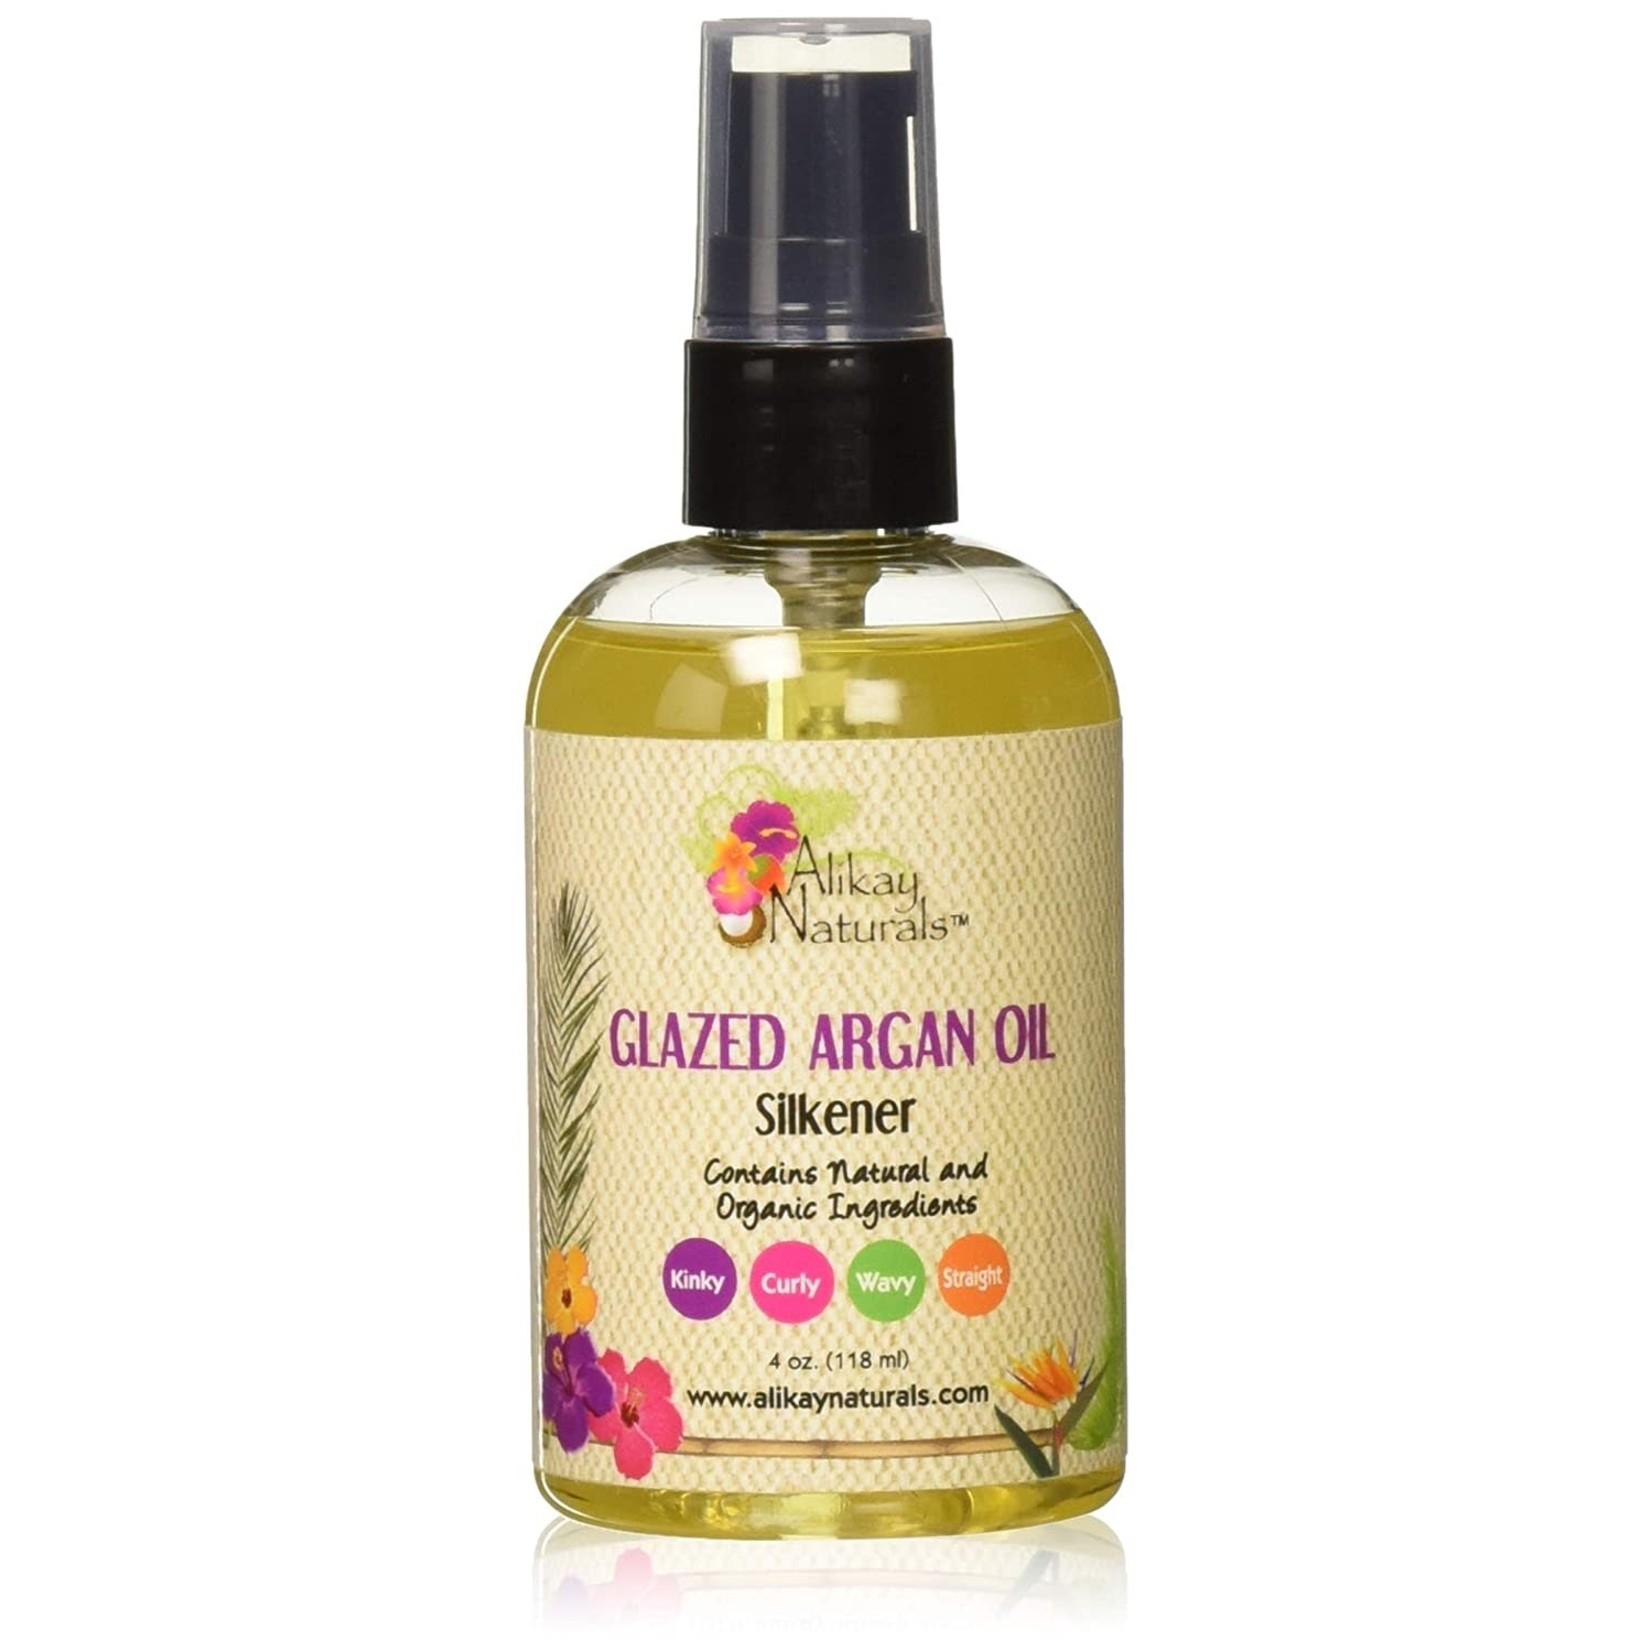 Alikay Natural Glazed Argan Oil Silkener